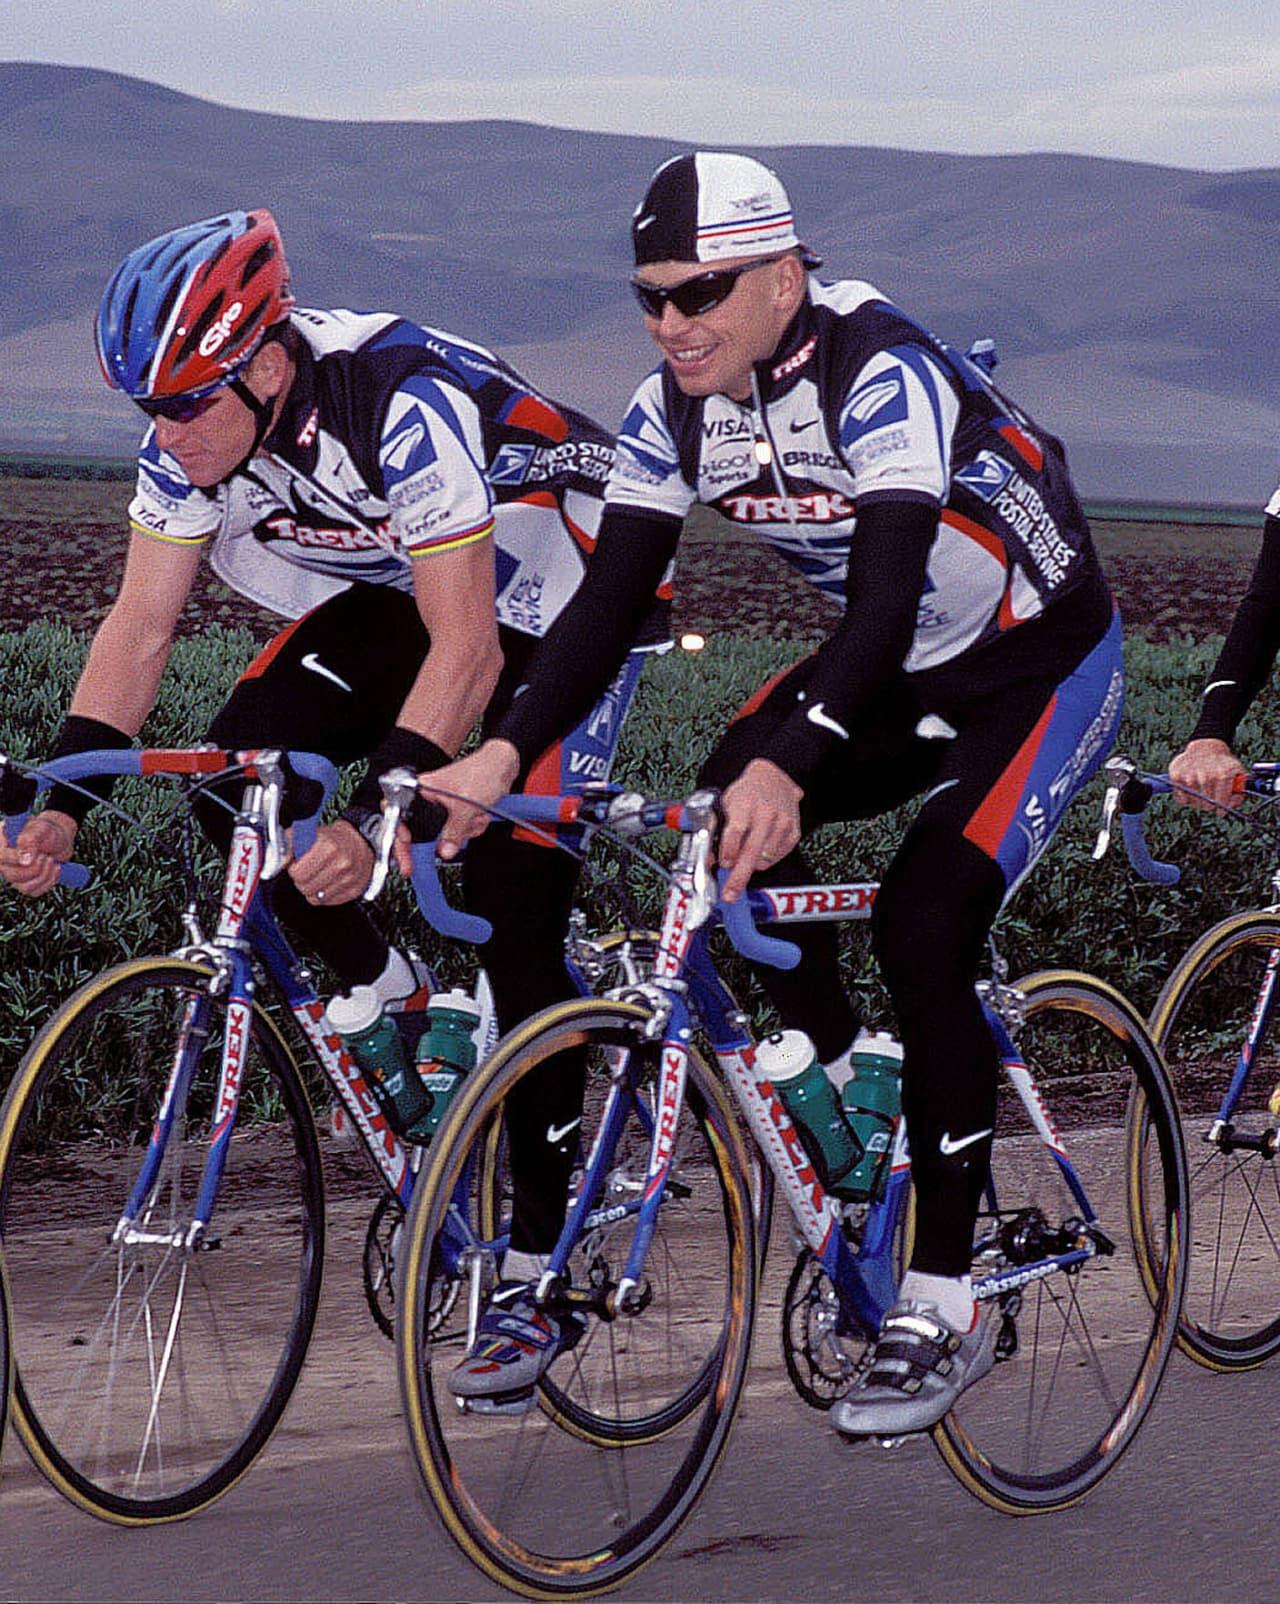 INGEN SMÅGUTT: Steffen Kjærgaard på treningsleir i California i år 2000. Foto: Håvard Solerød